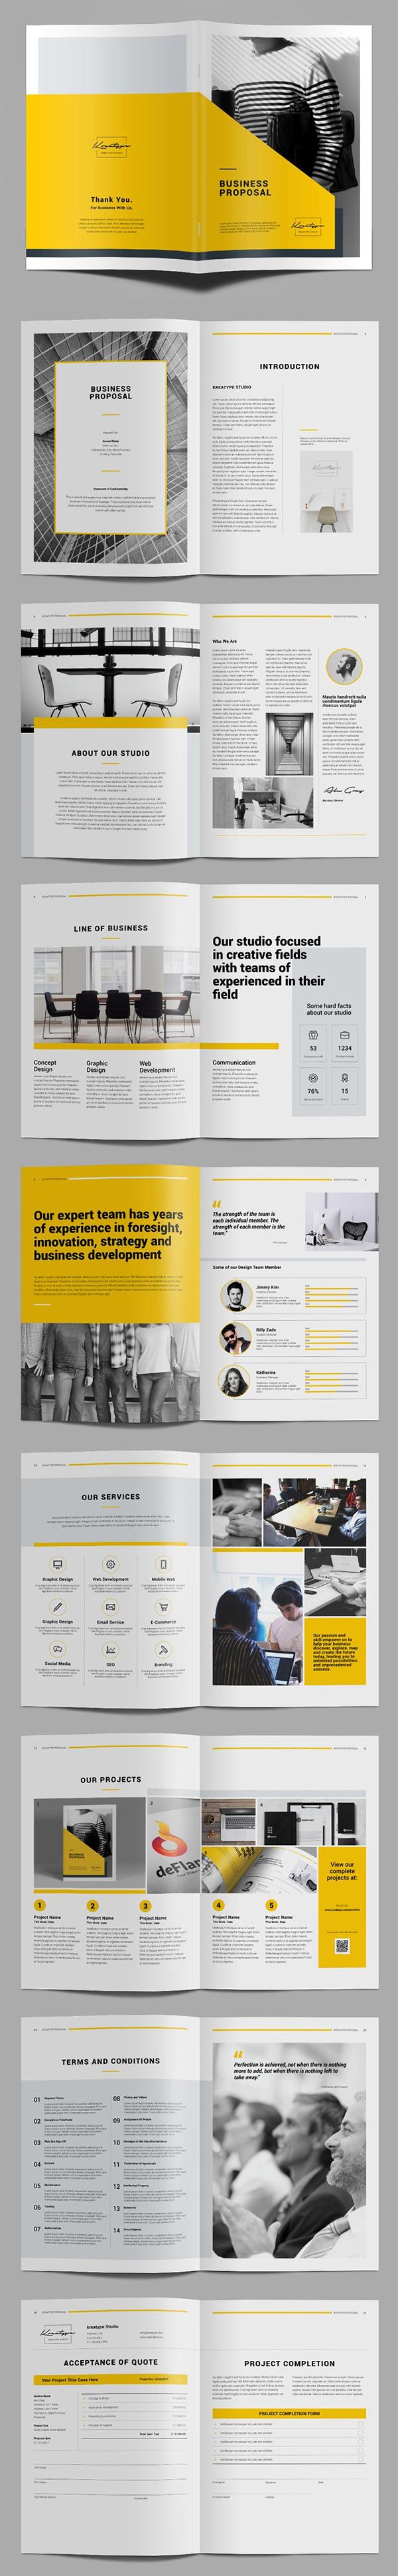 Kreatype Proposal Brochure Template